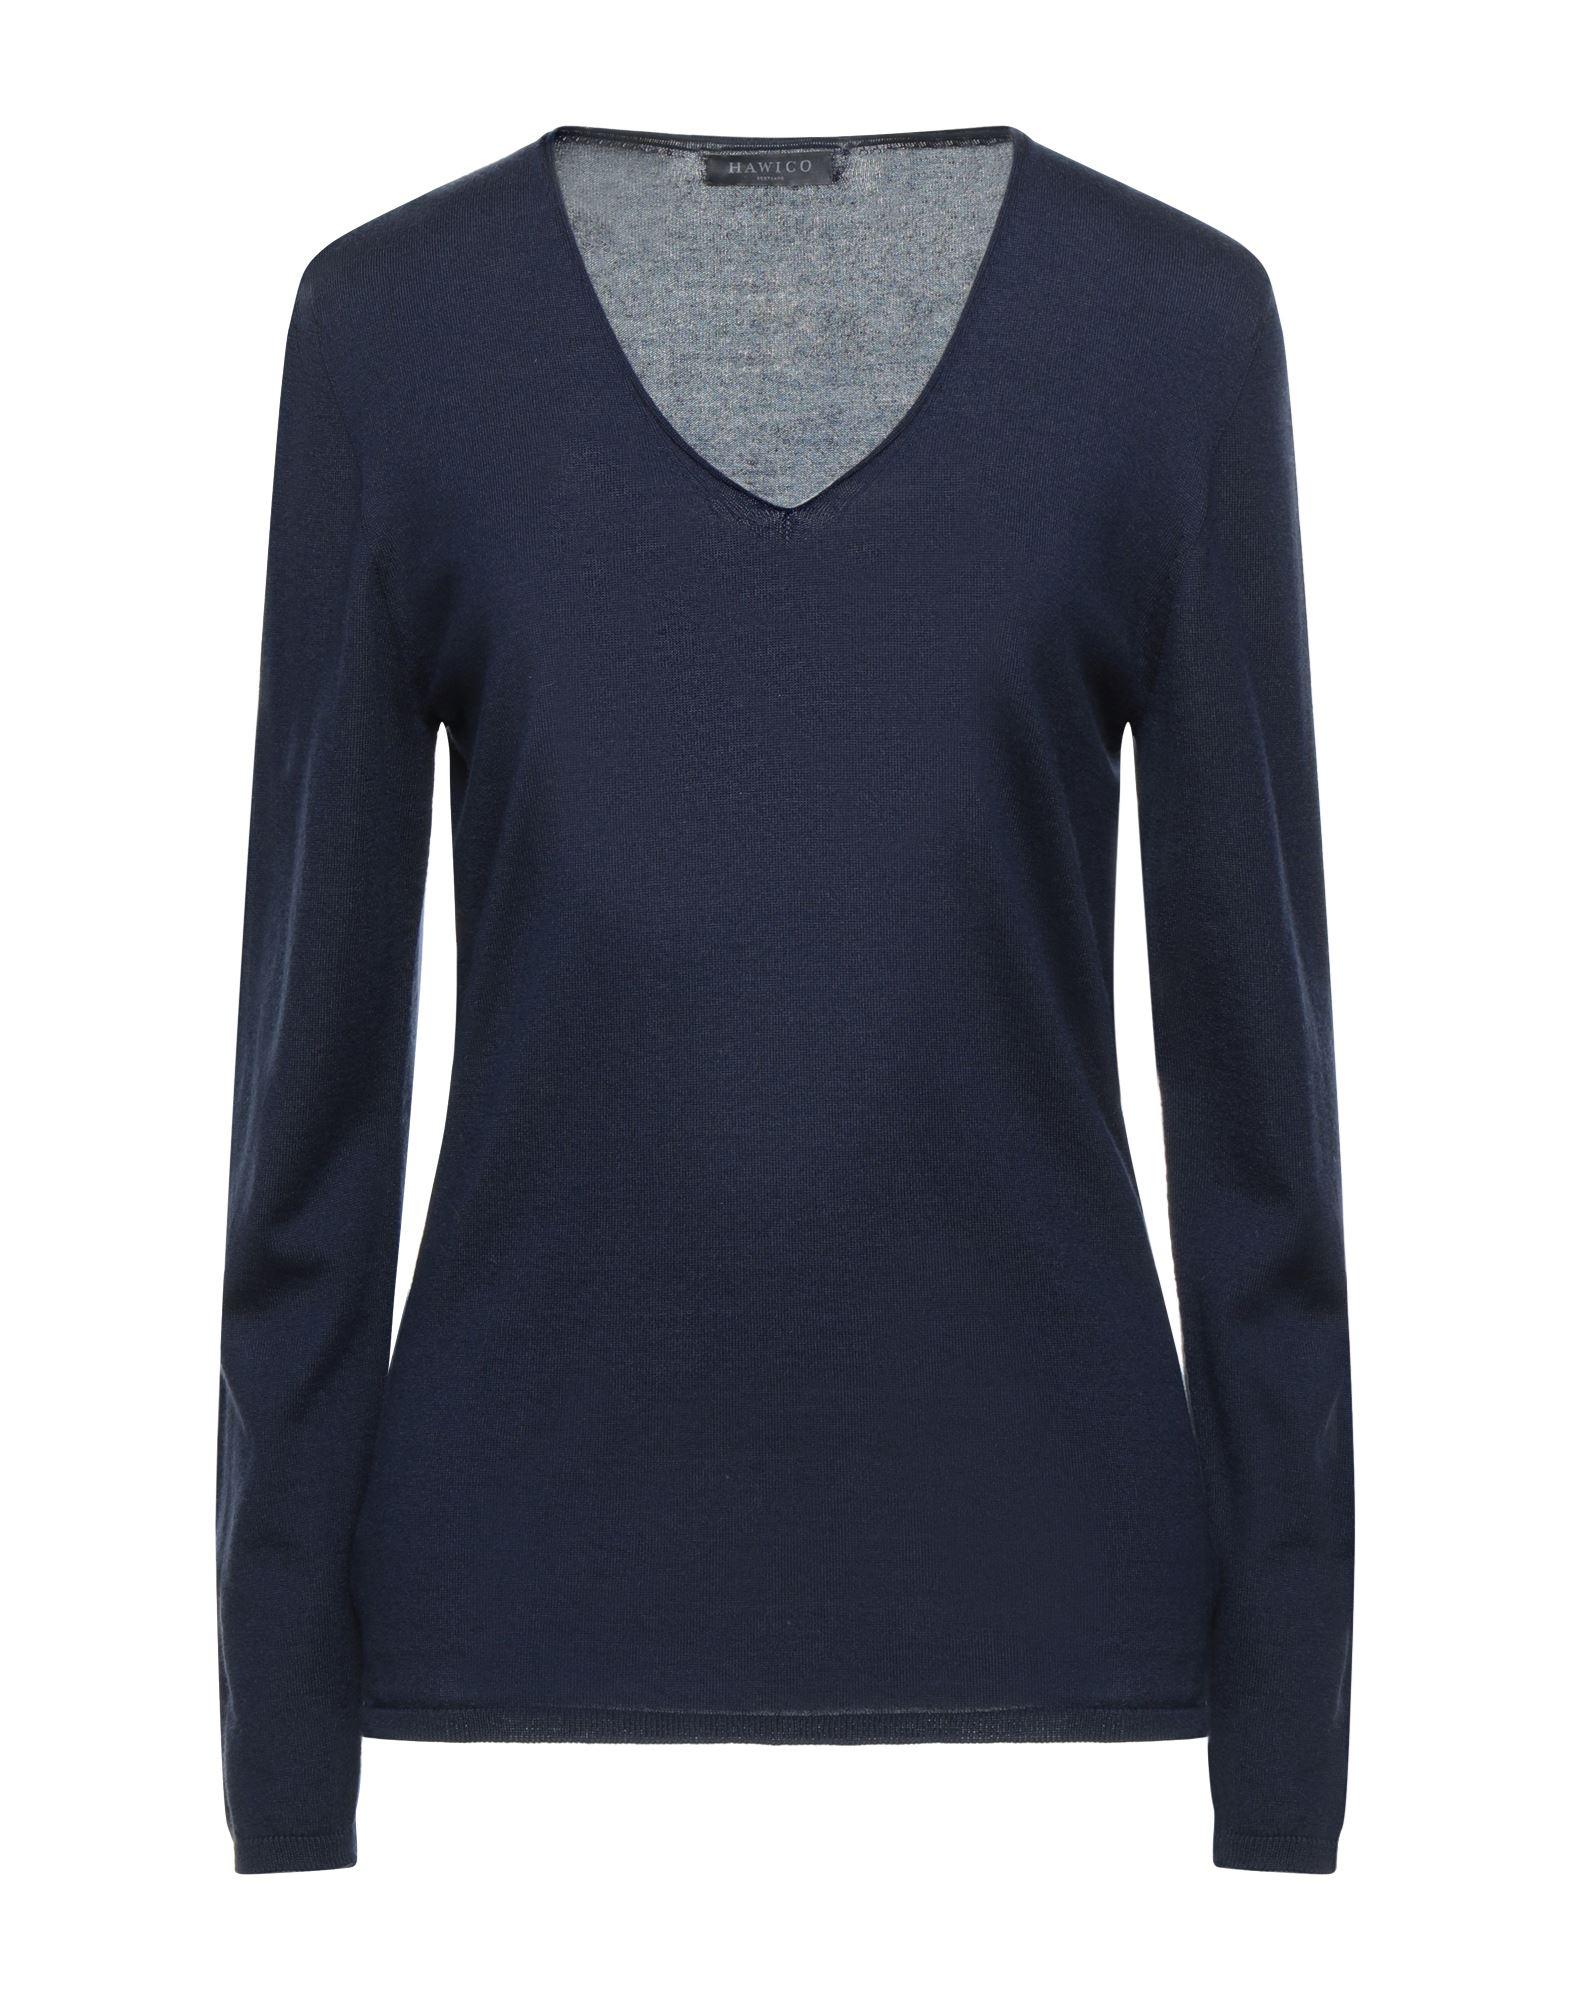 HAWICO Sweaters - Item 14129585